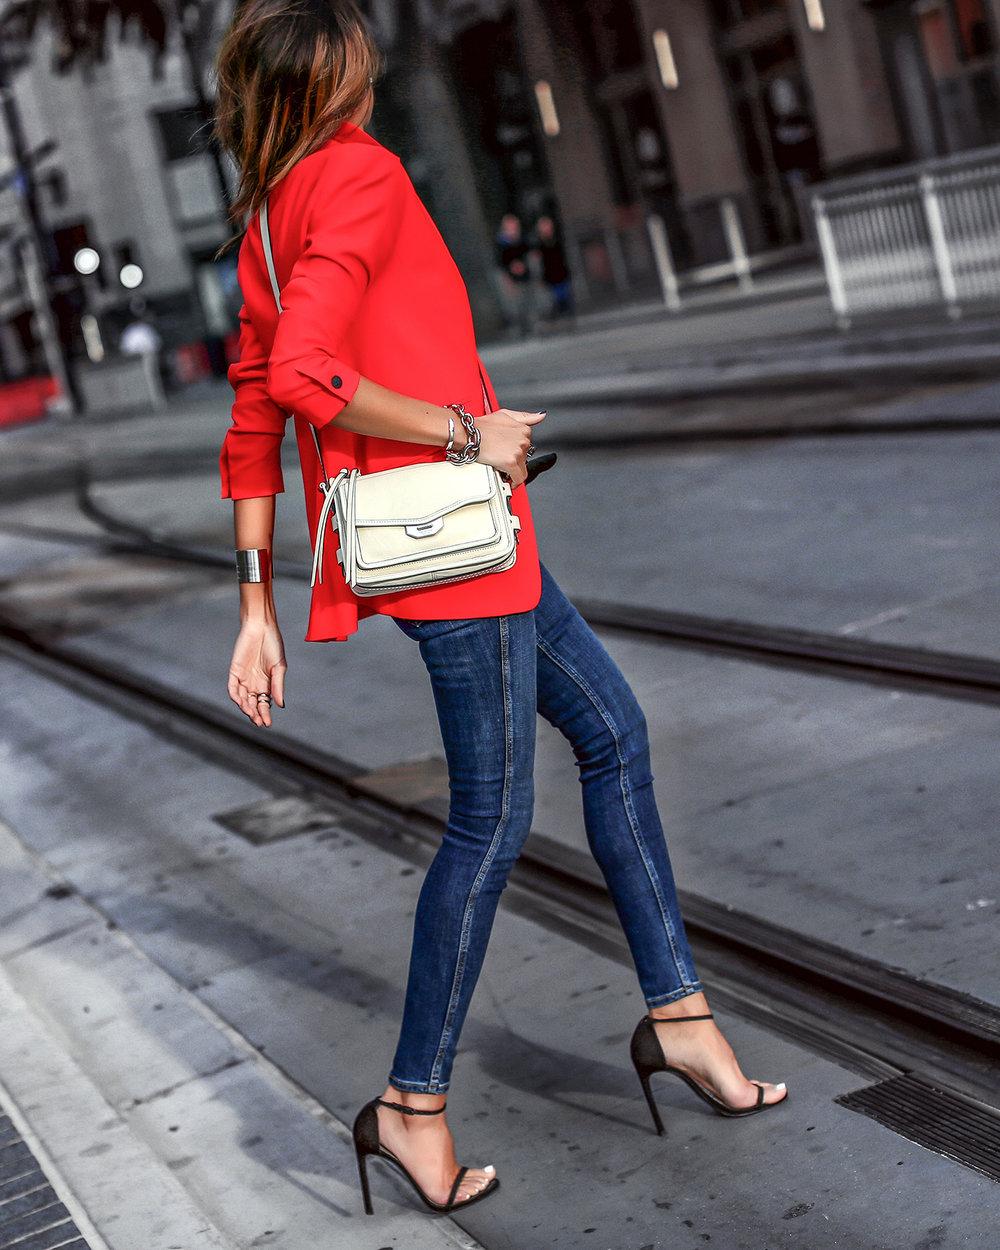 Rag and Bone Denim Red BLazer Streetstyle Spring Style.jpg